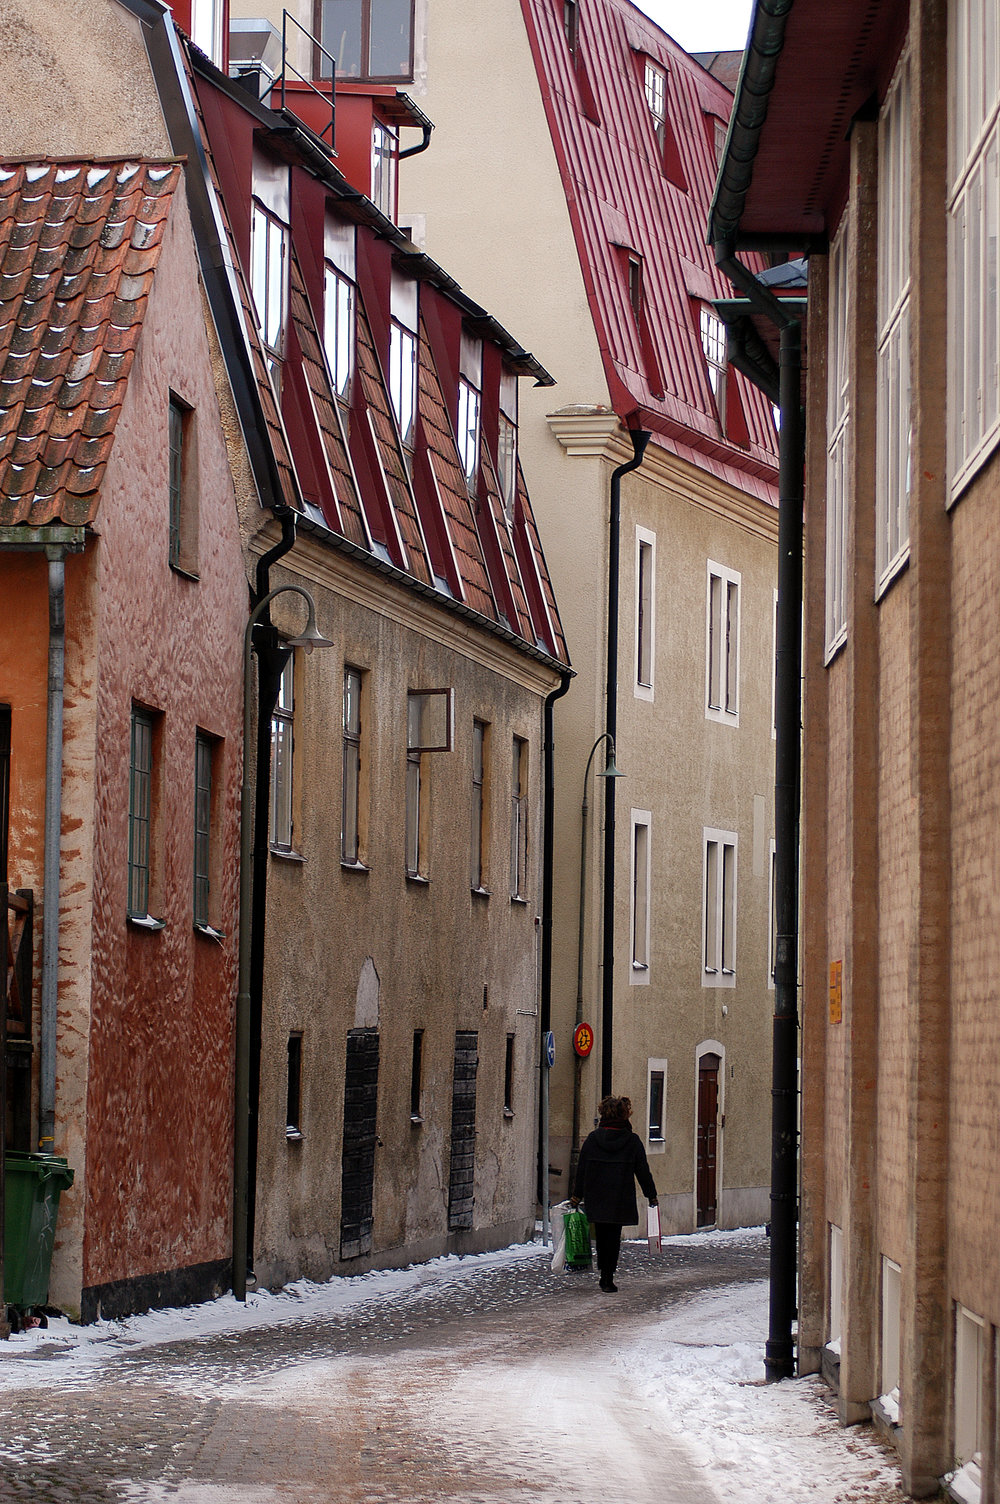 Visby, Gotlanti. Perun puheeni. Visbyssä on jouluna ihanan rauhallista.